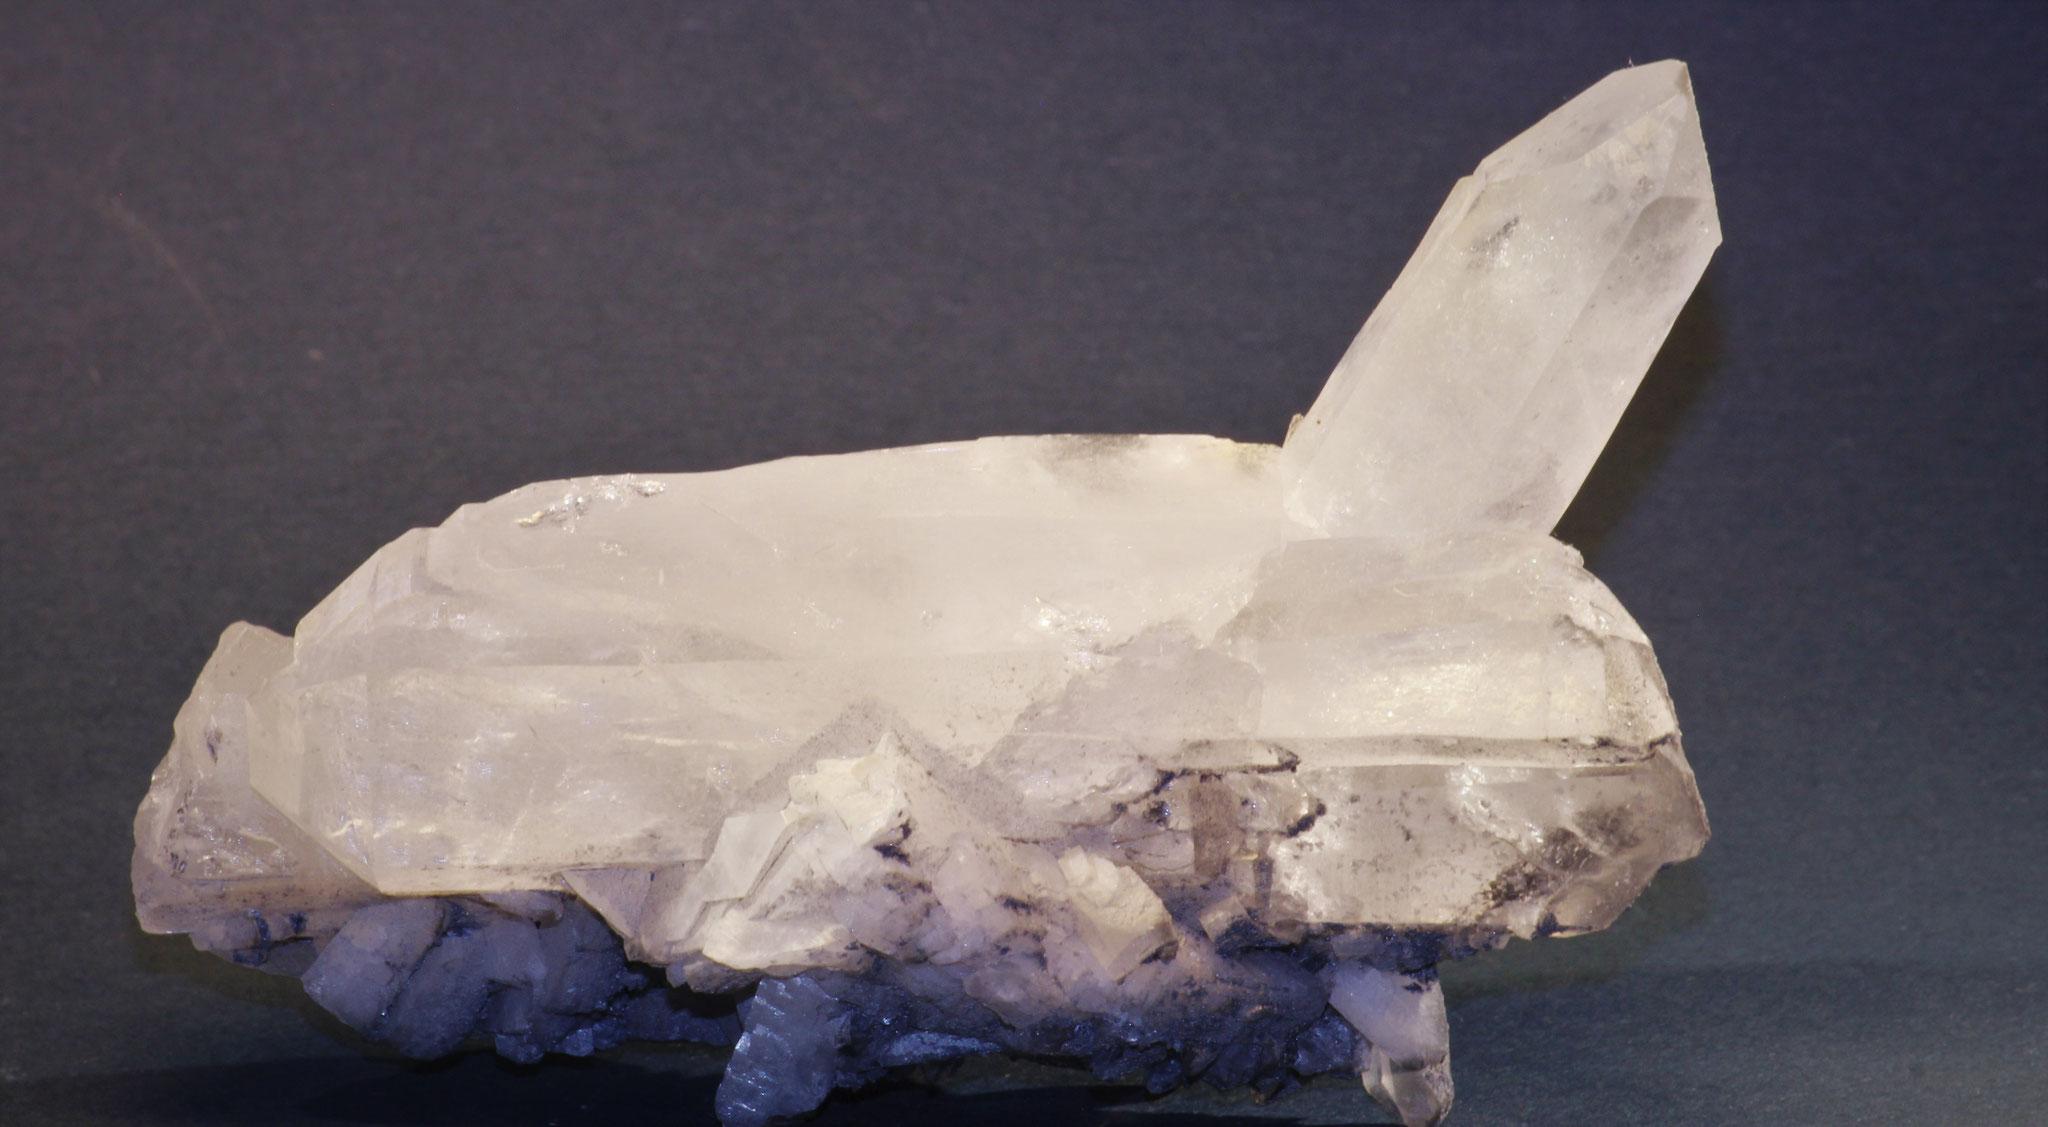 Bergkristall - Beverin (GR)